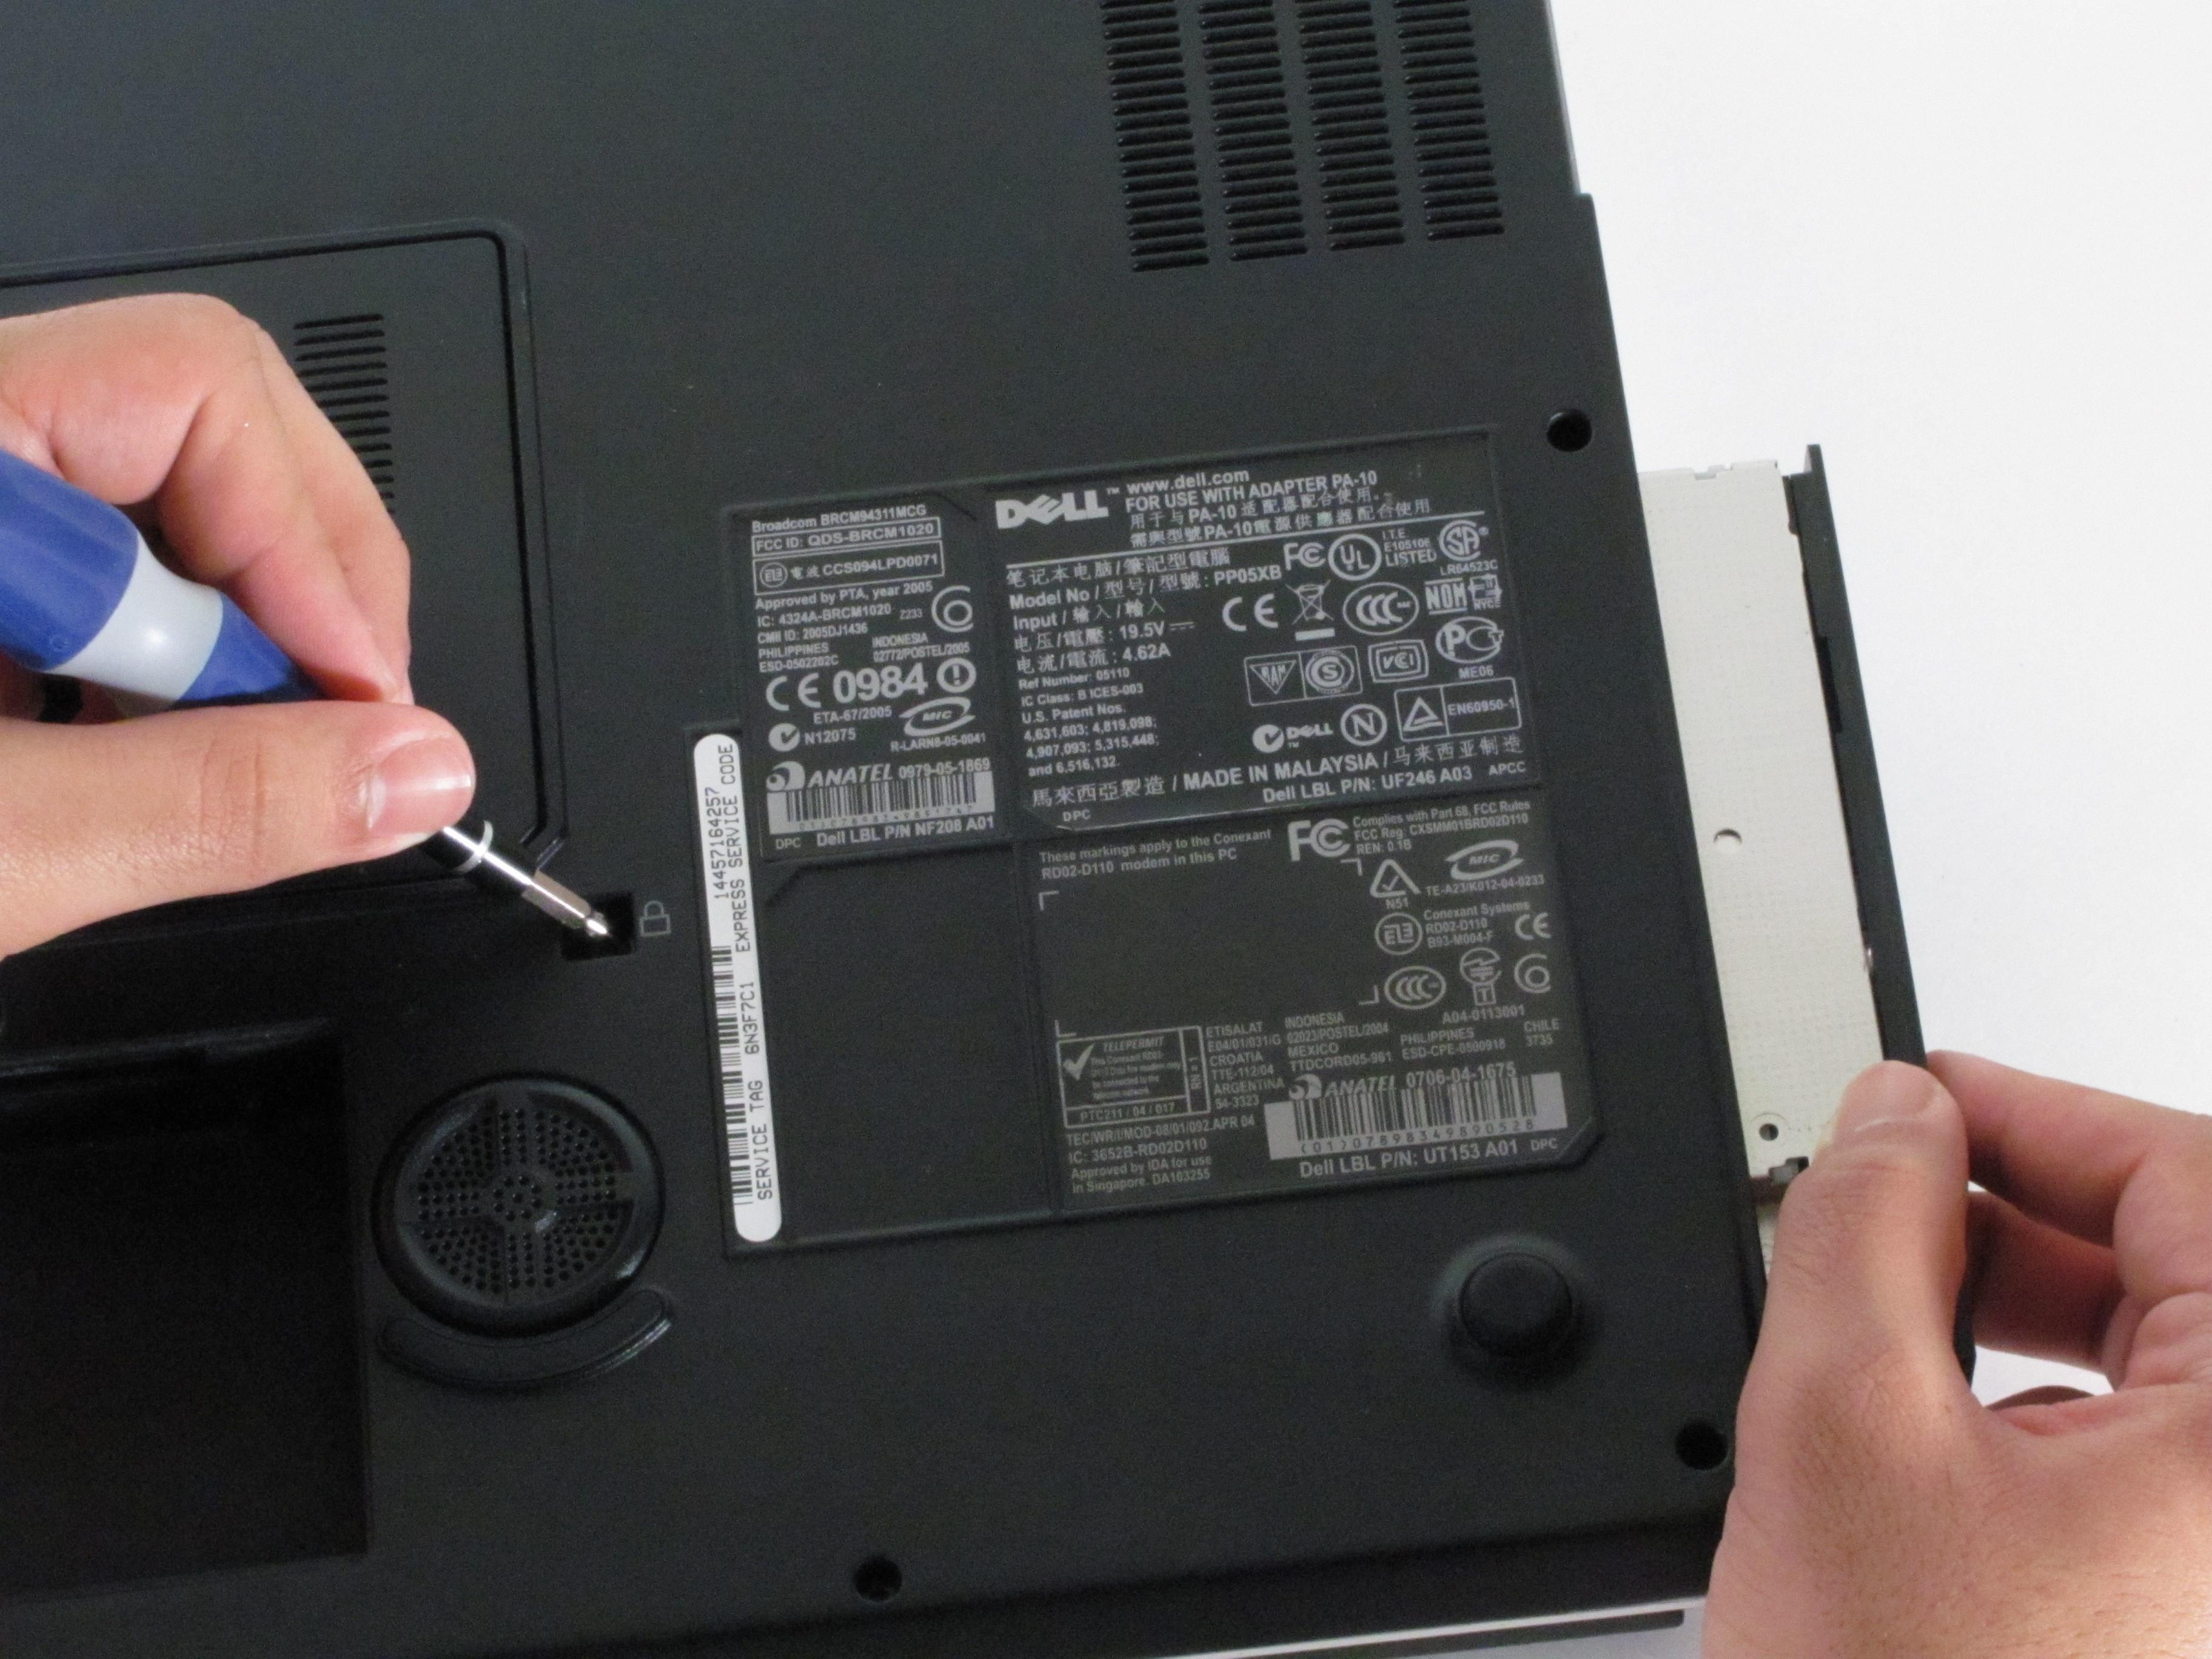 dell inspiron e1705 repair ifixit rh ifixit com Dell Inspiron E1705 Problems Dell Inspiron E1705 Memory